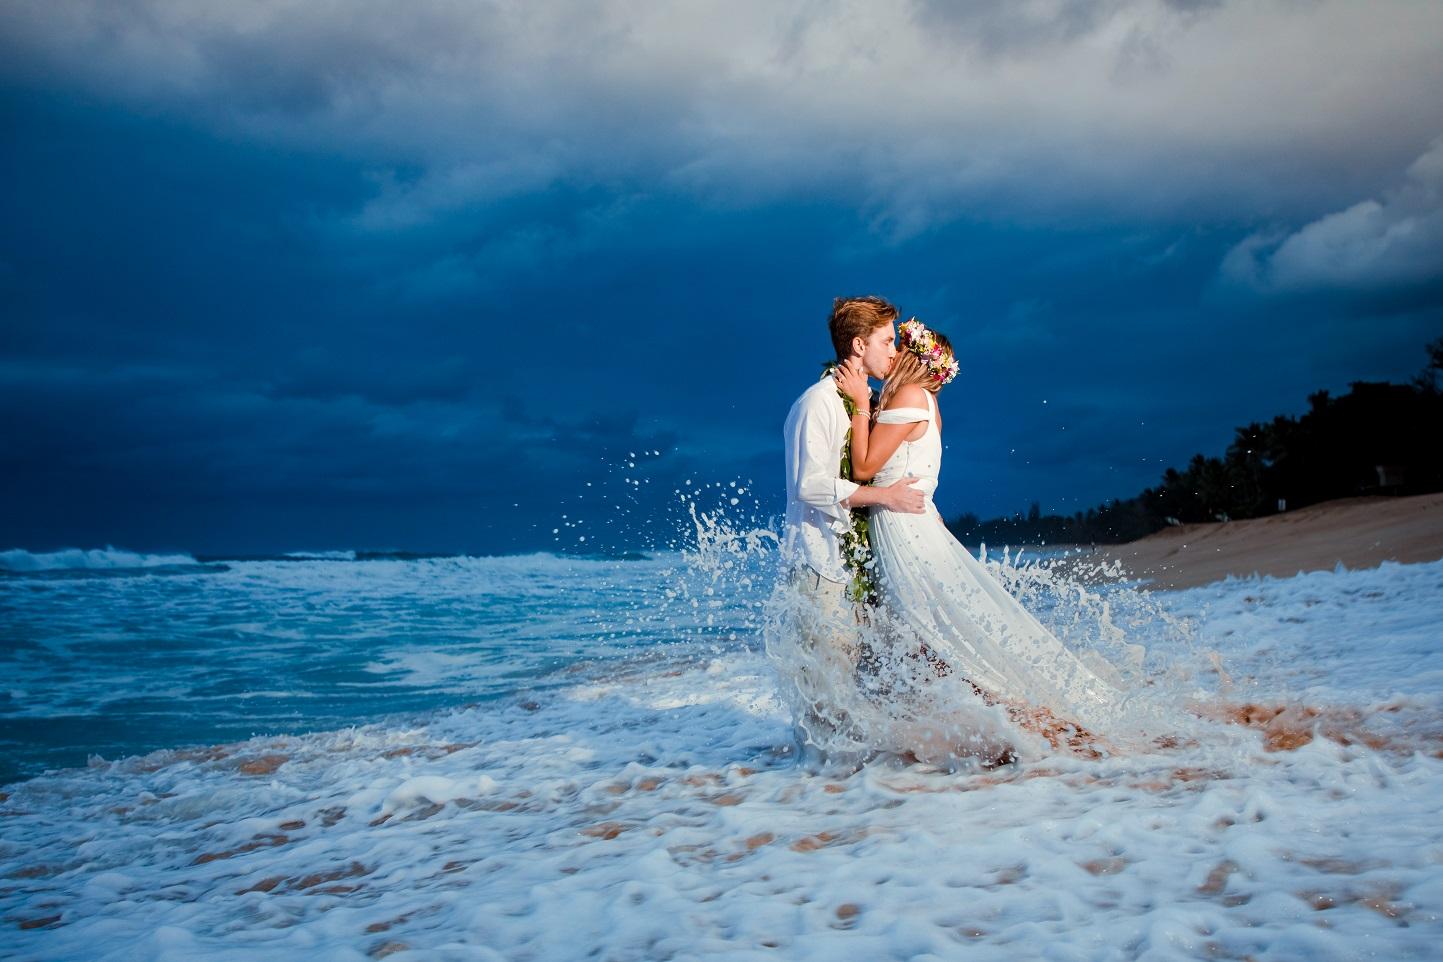 bride and groom sunset beach waves surf wedding portrait